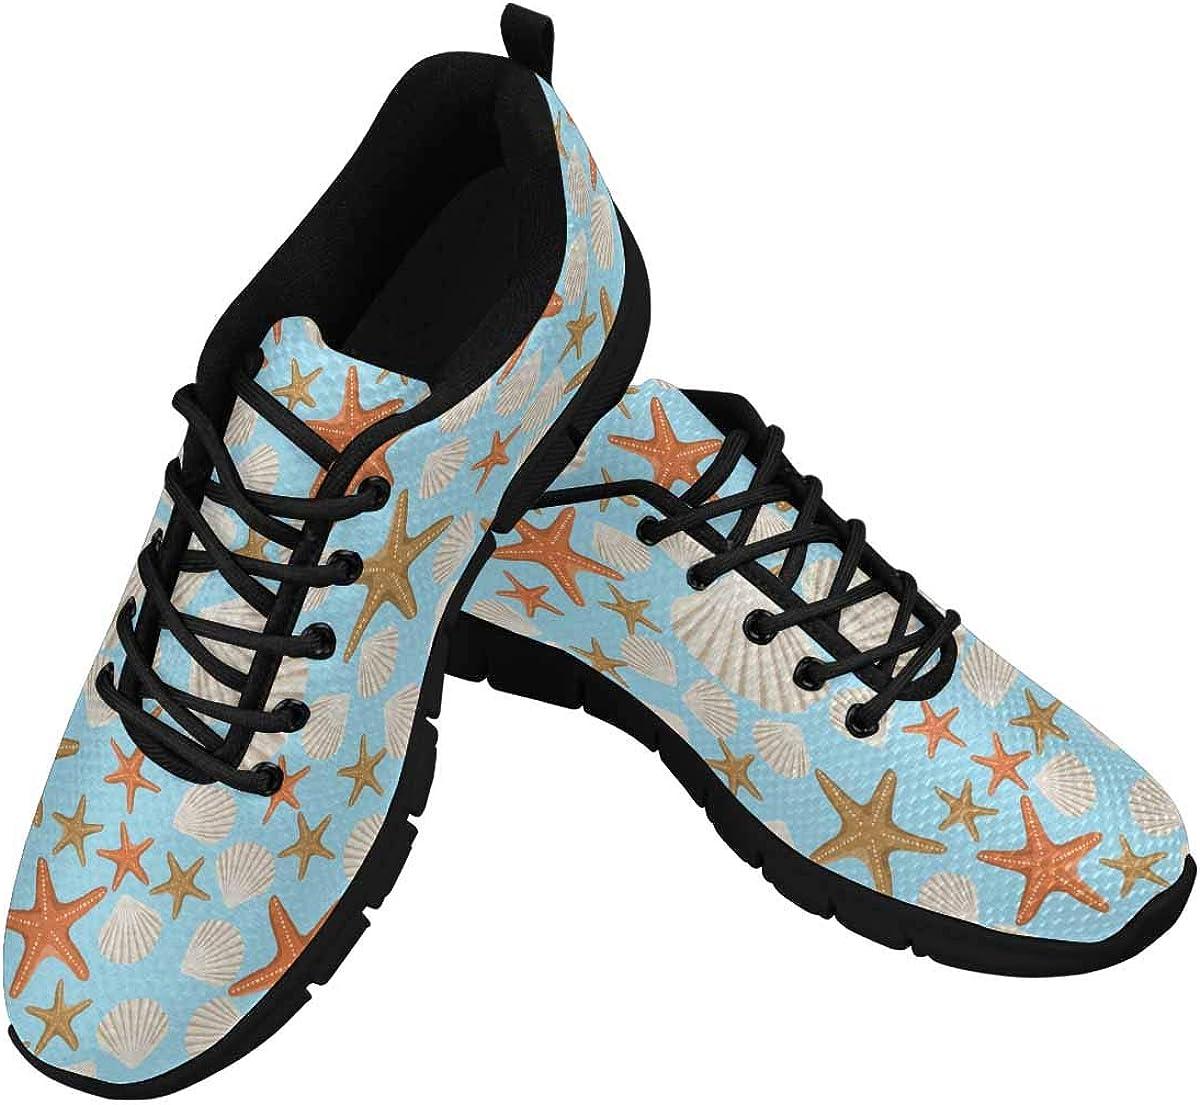 INTERESTPRINT Sea Pattern White Shells and Starfish Women's Athletic Walking Shoes Comfort Mesh Non Slip